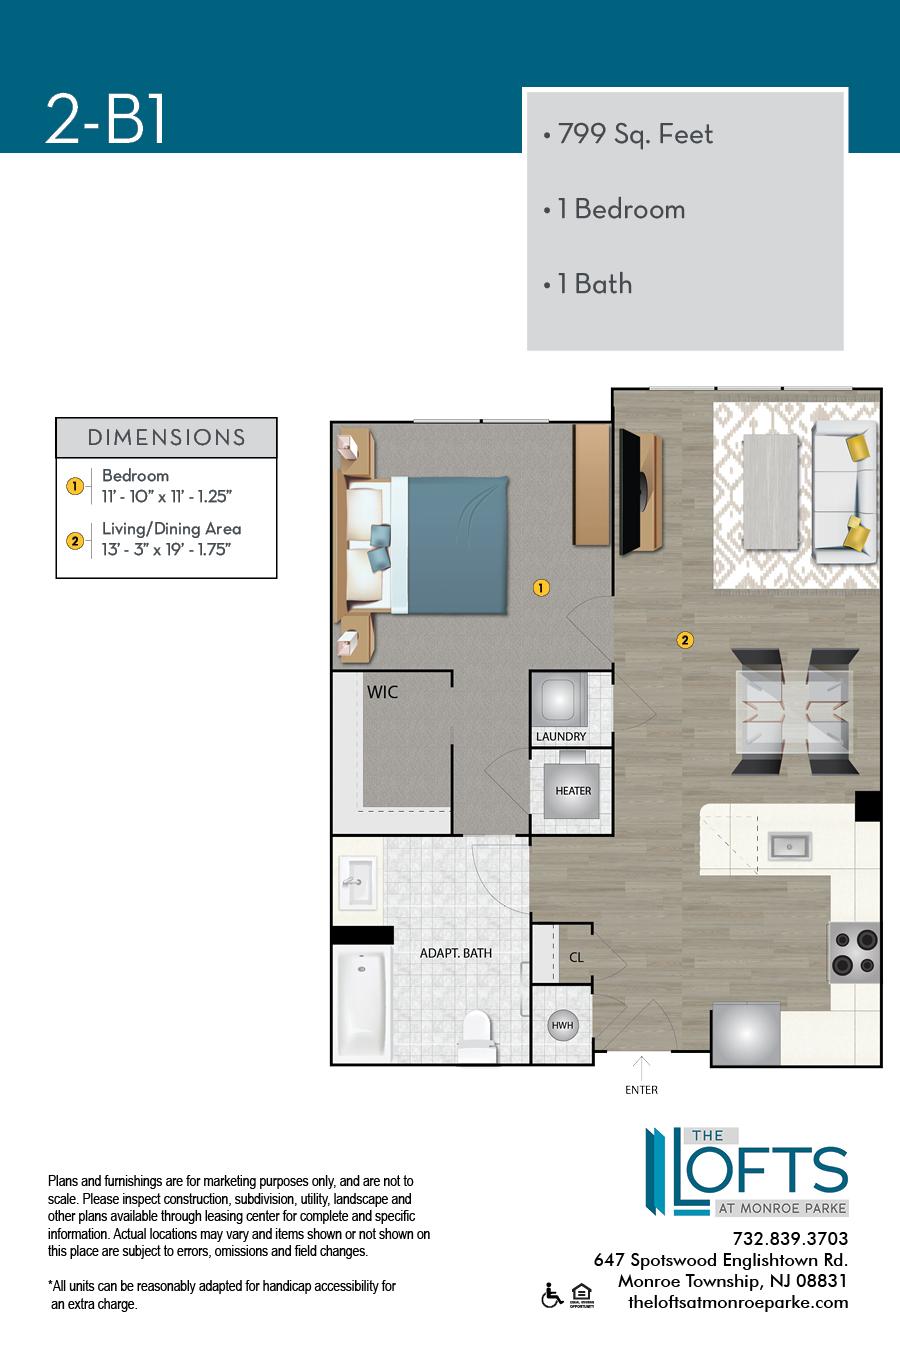 2-B1 Floor Plan